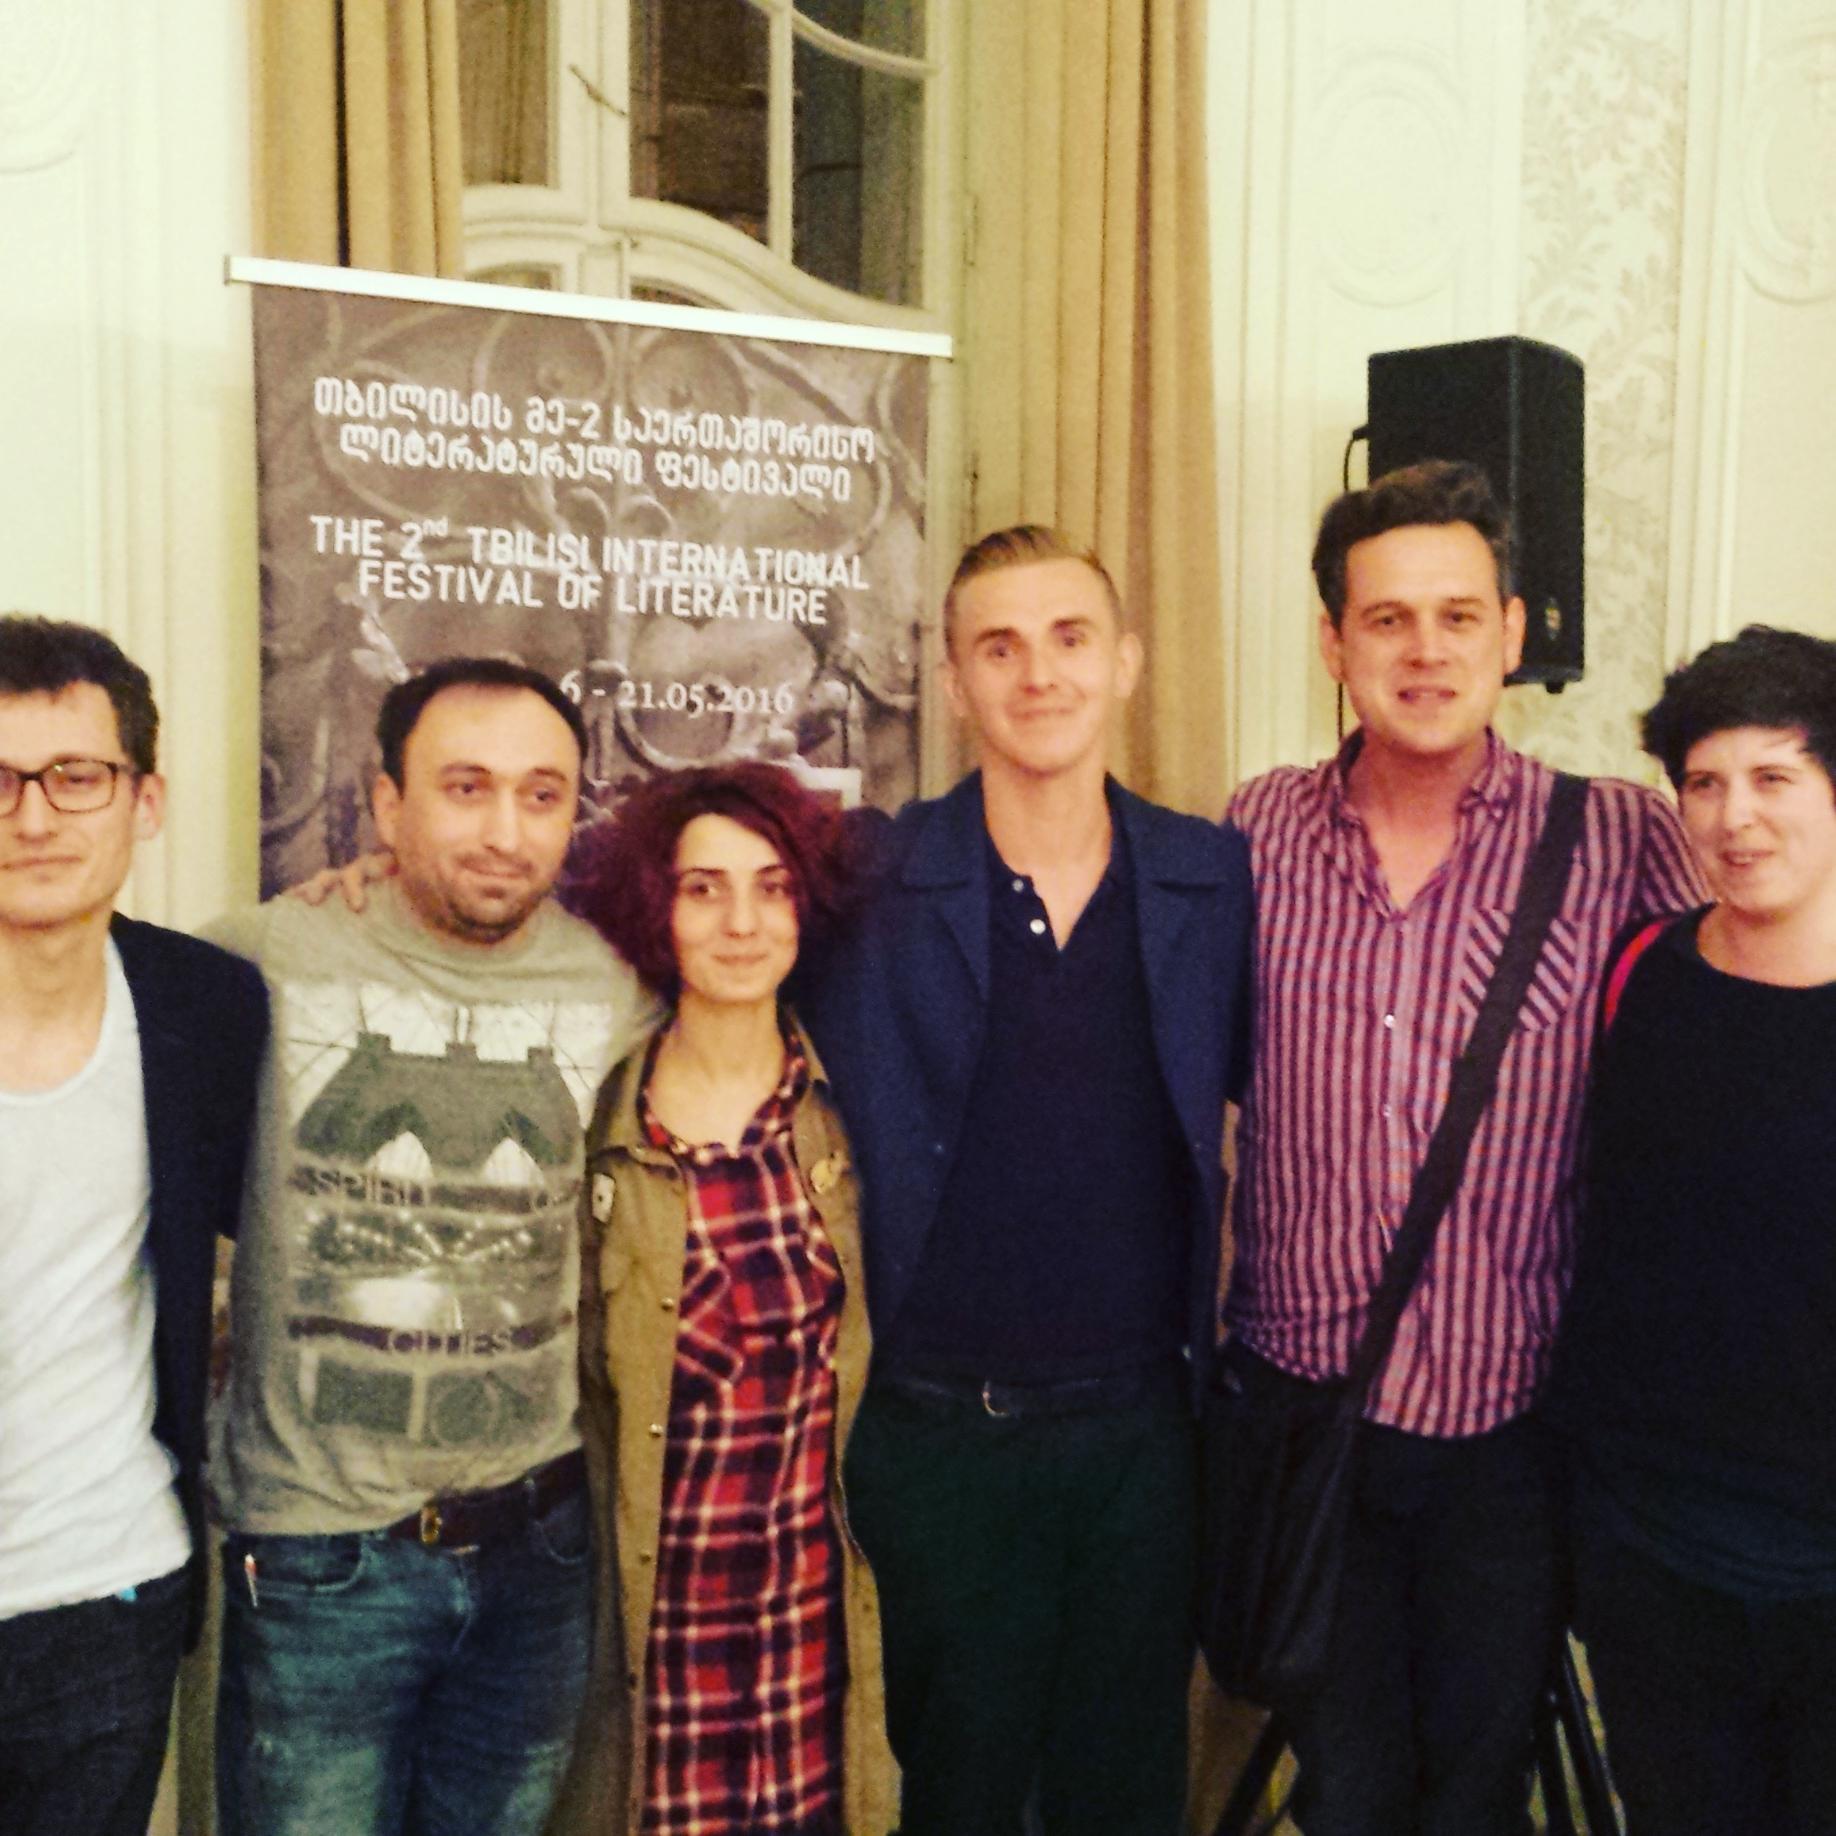 Tbilisi International Literature Festival, Georgia 2016